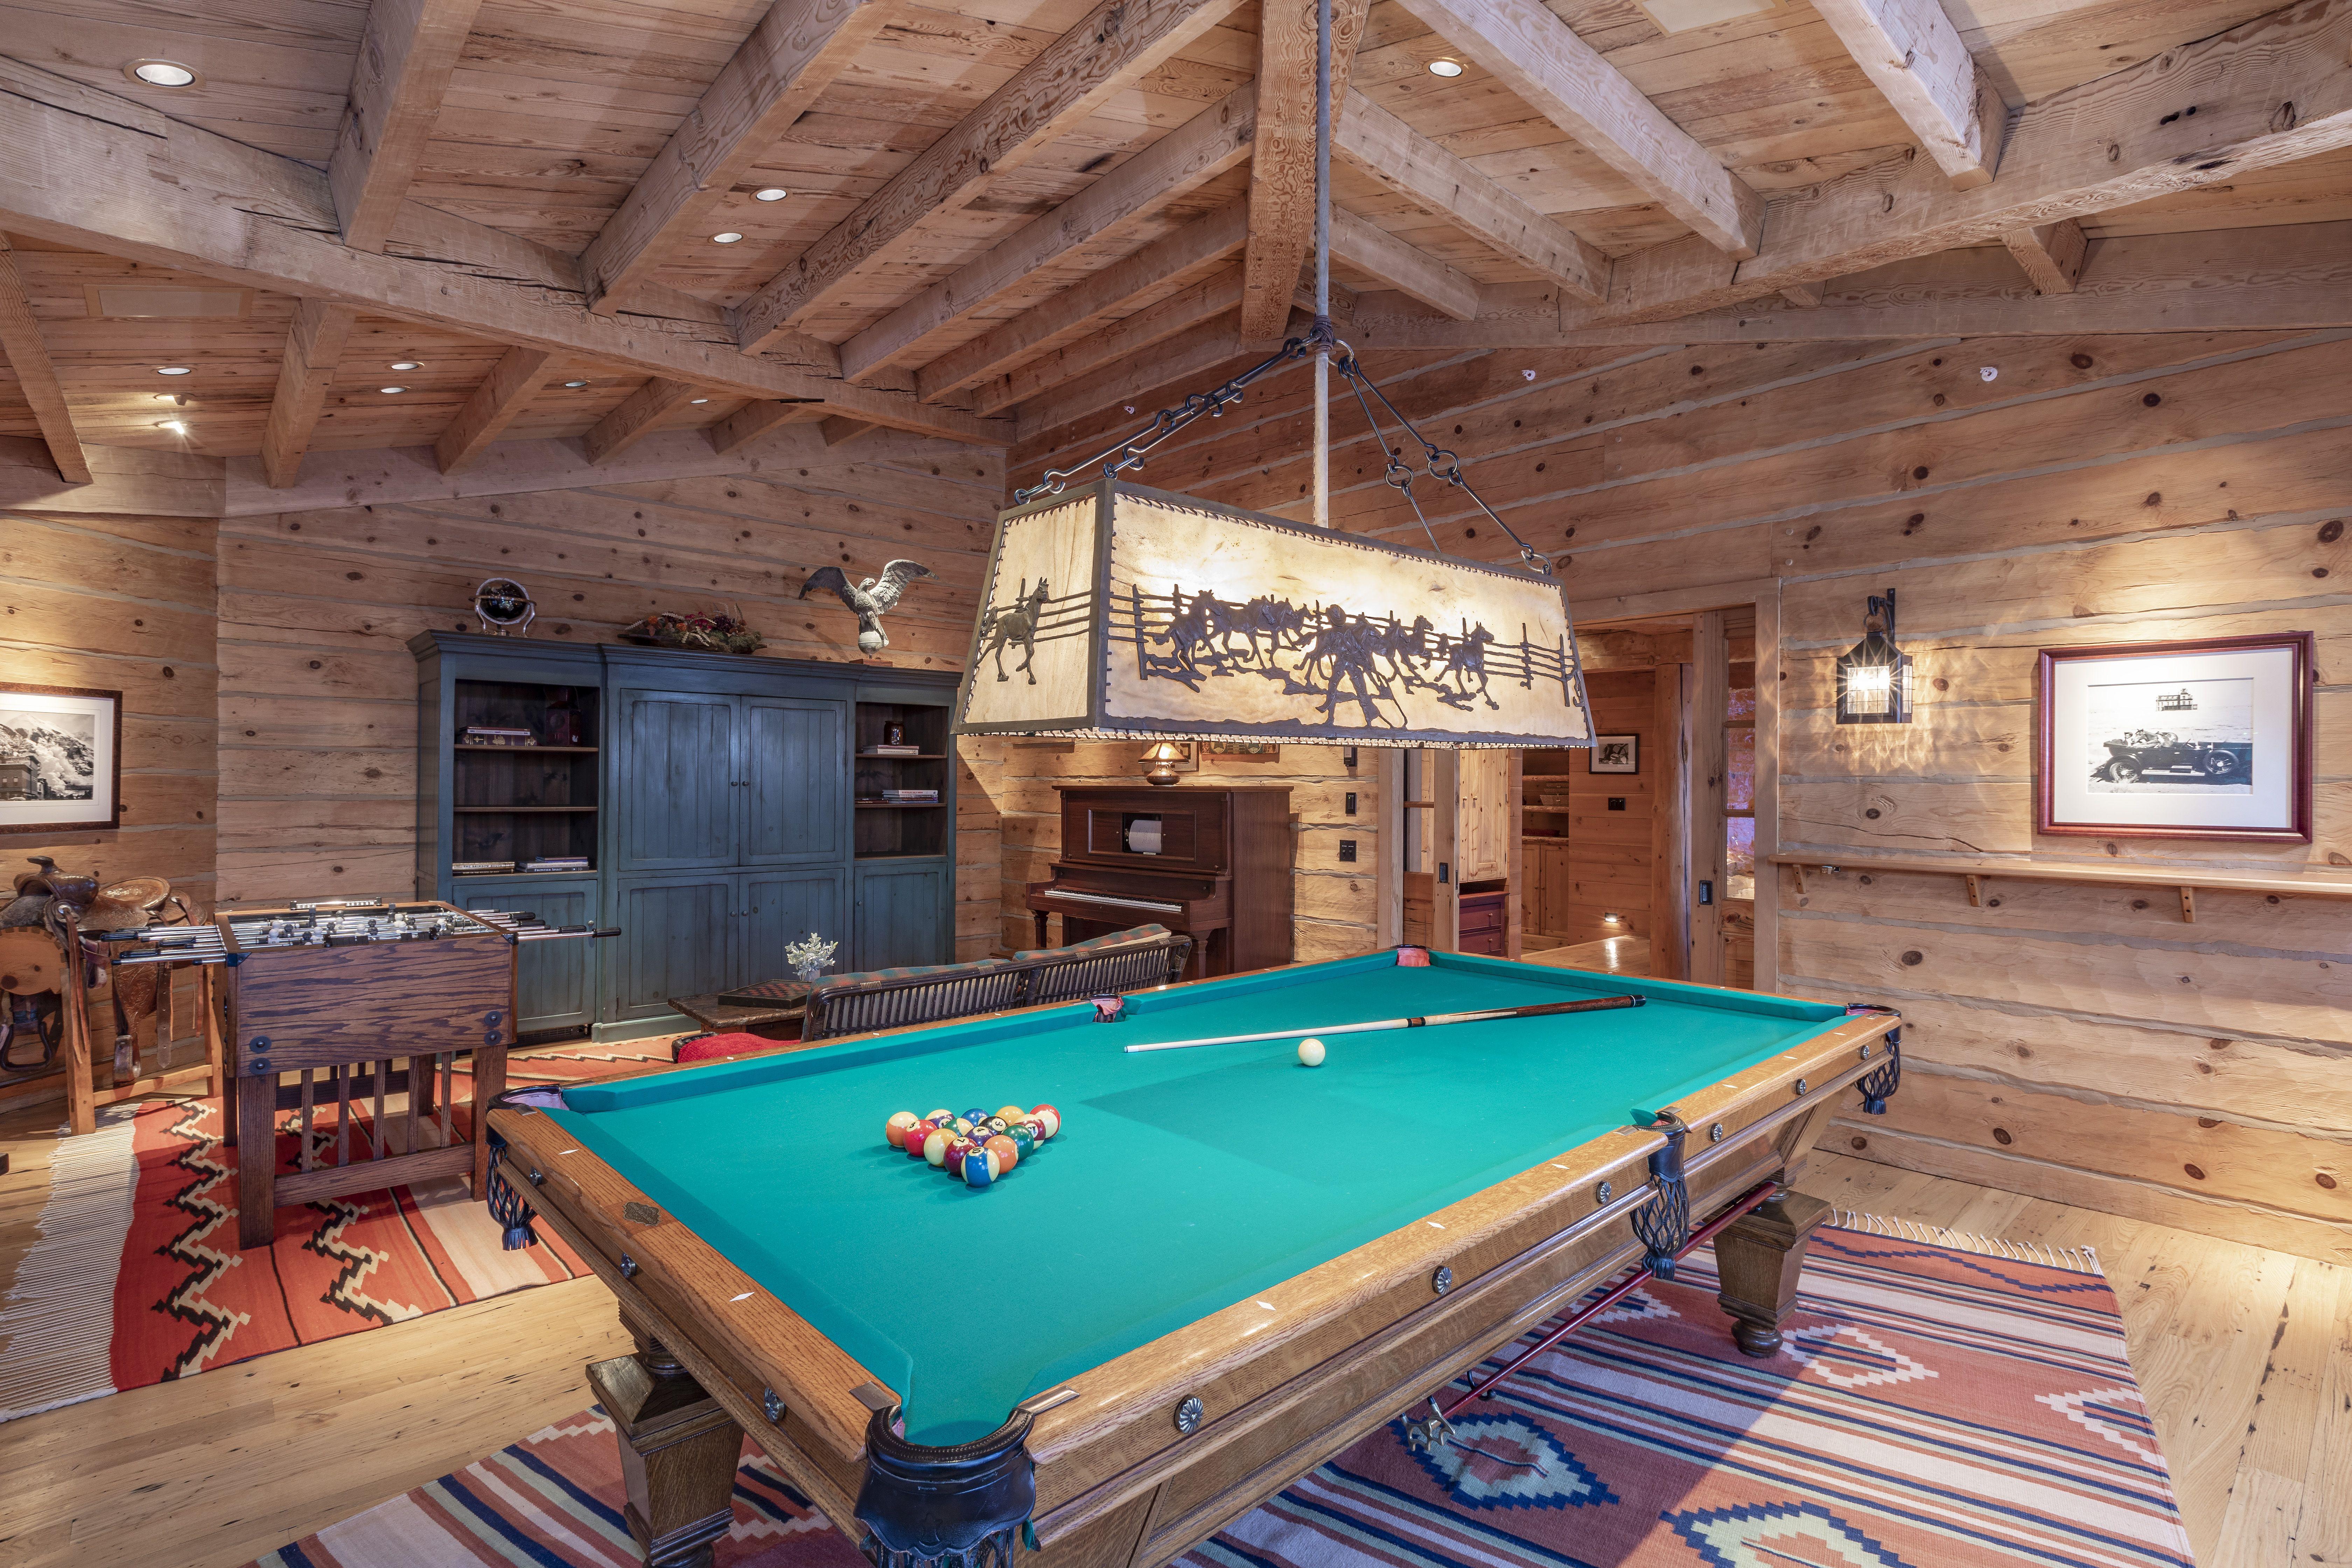 Tom Cruise's Telluride Ranch billiards room